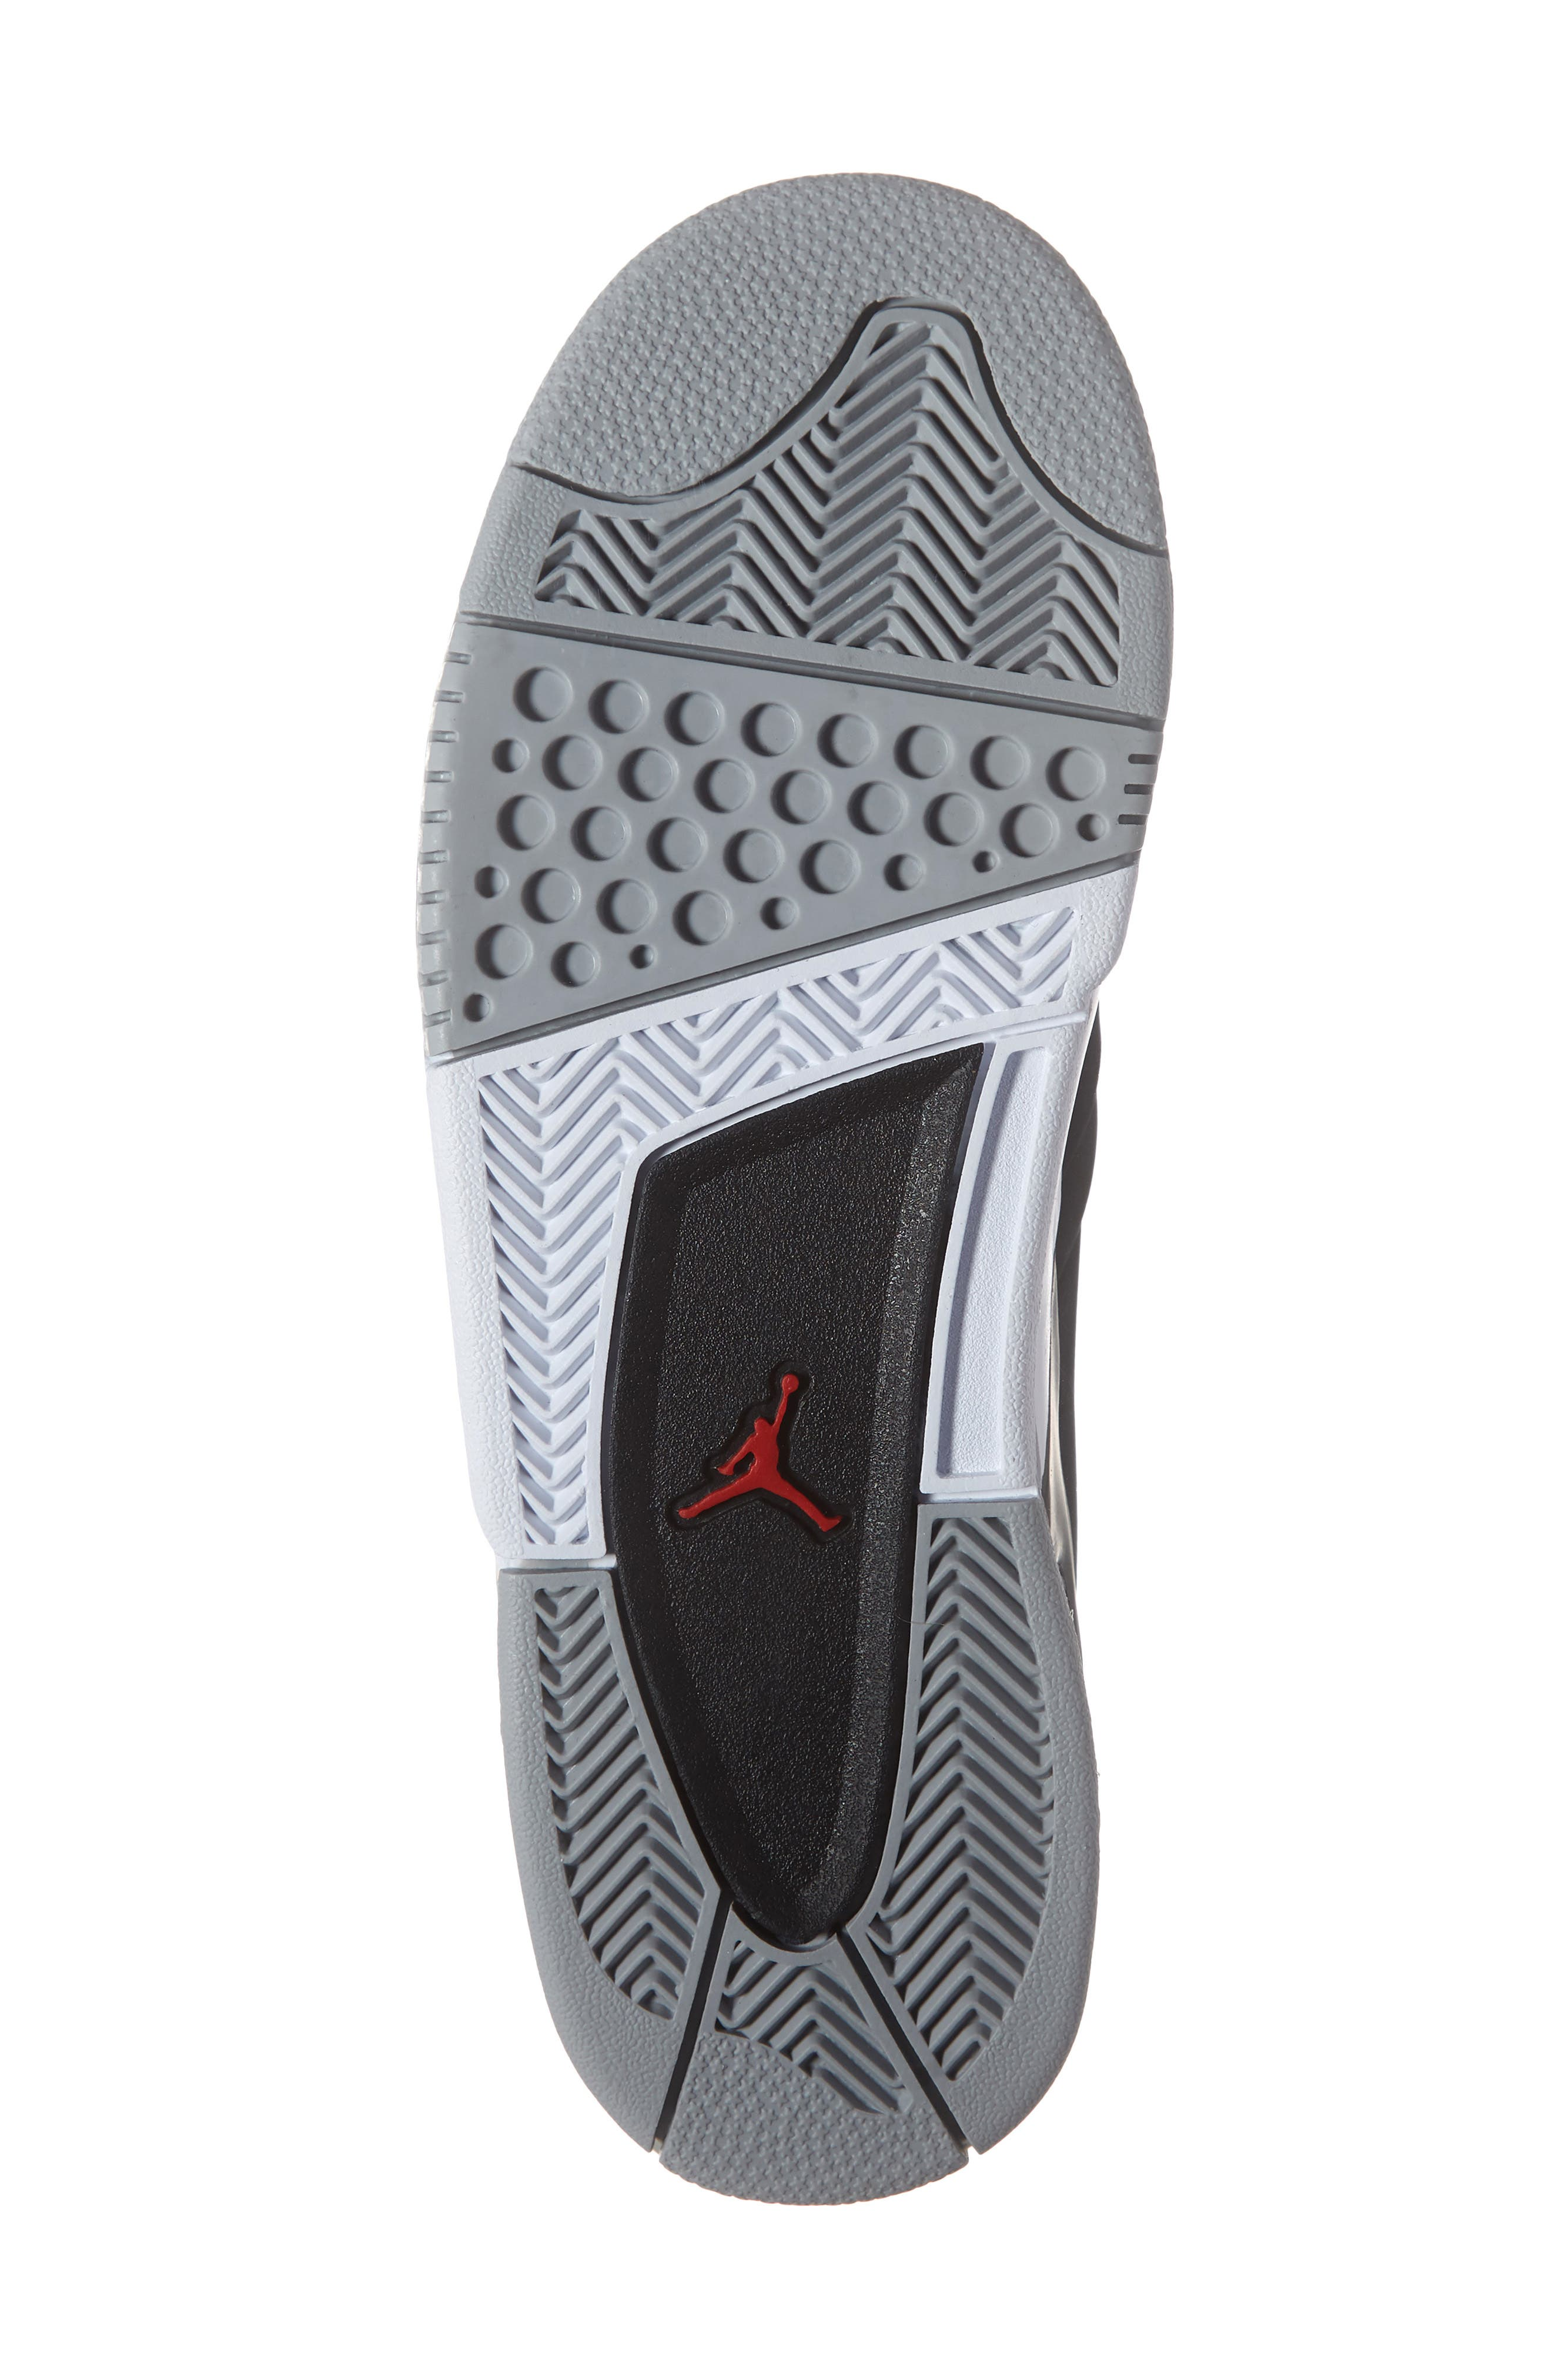 JORDAN, Big Fund Mid Top Basketball Sneaker, Alternate thumbnail 6, color, BLACK/ METALLIC SILVER-WHITE